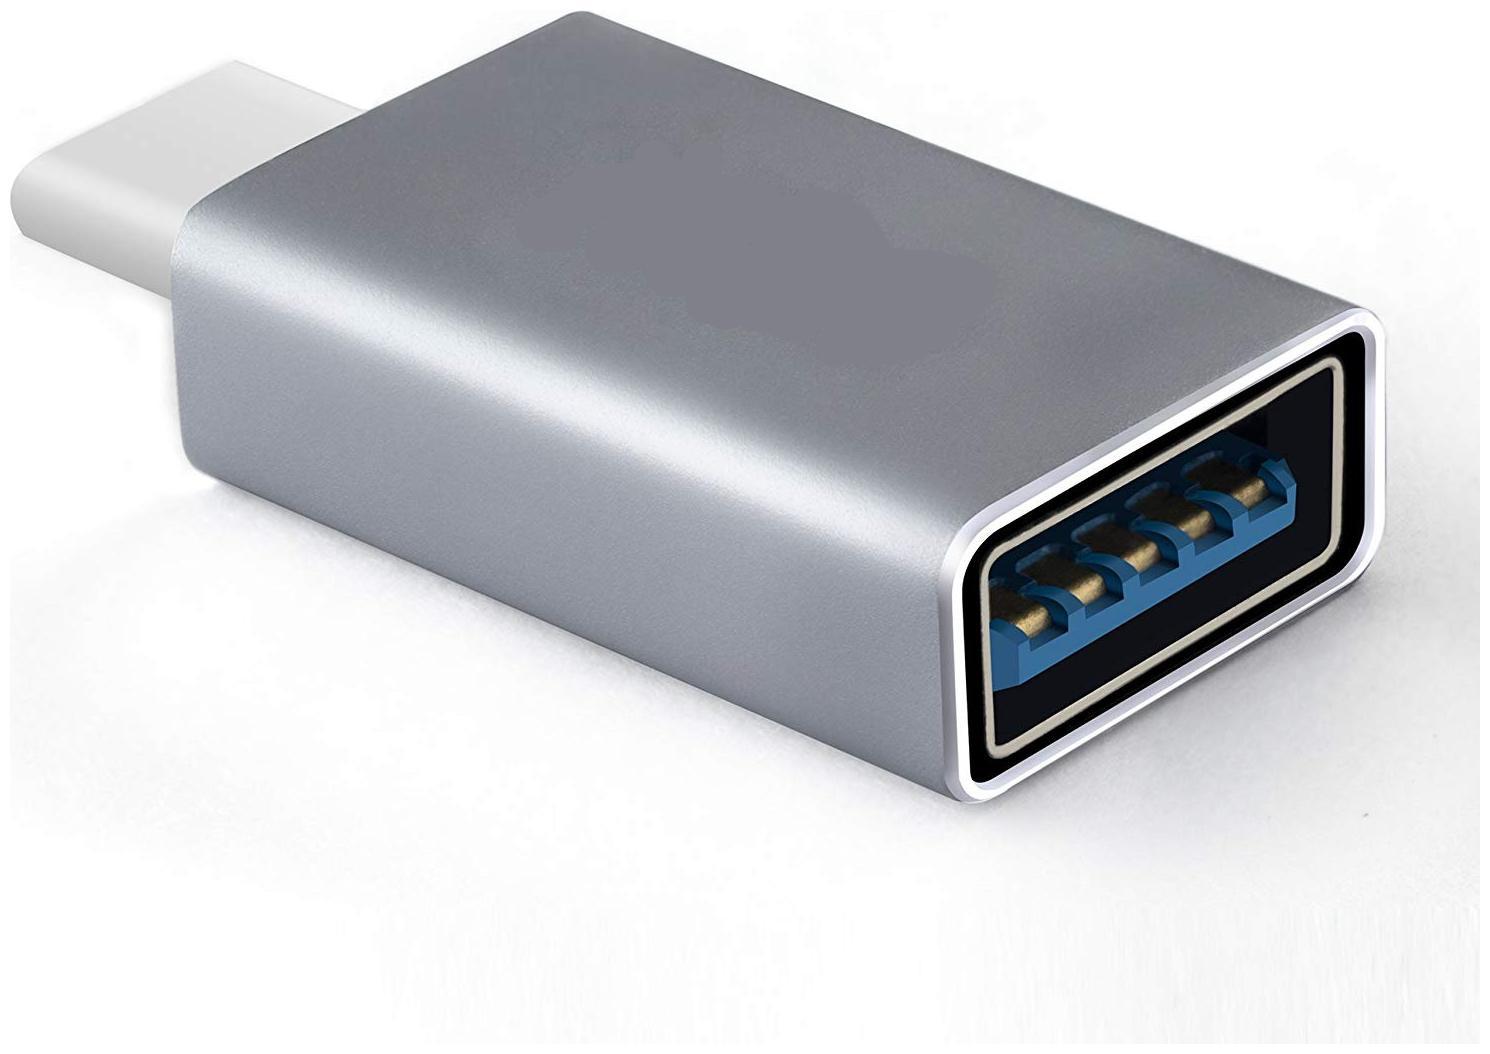 https://assetscdn1.paytm.com/images/catalog/product/M/MO/MOBGADGETX-USB-GADG1059264568E242D/1564135051457_0..jpg